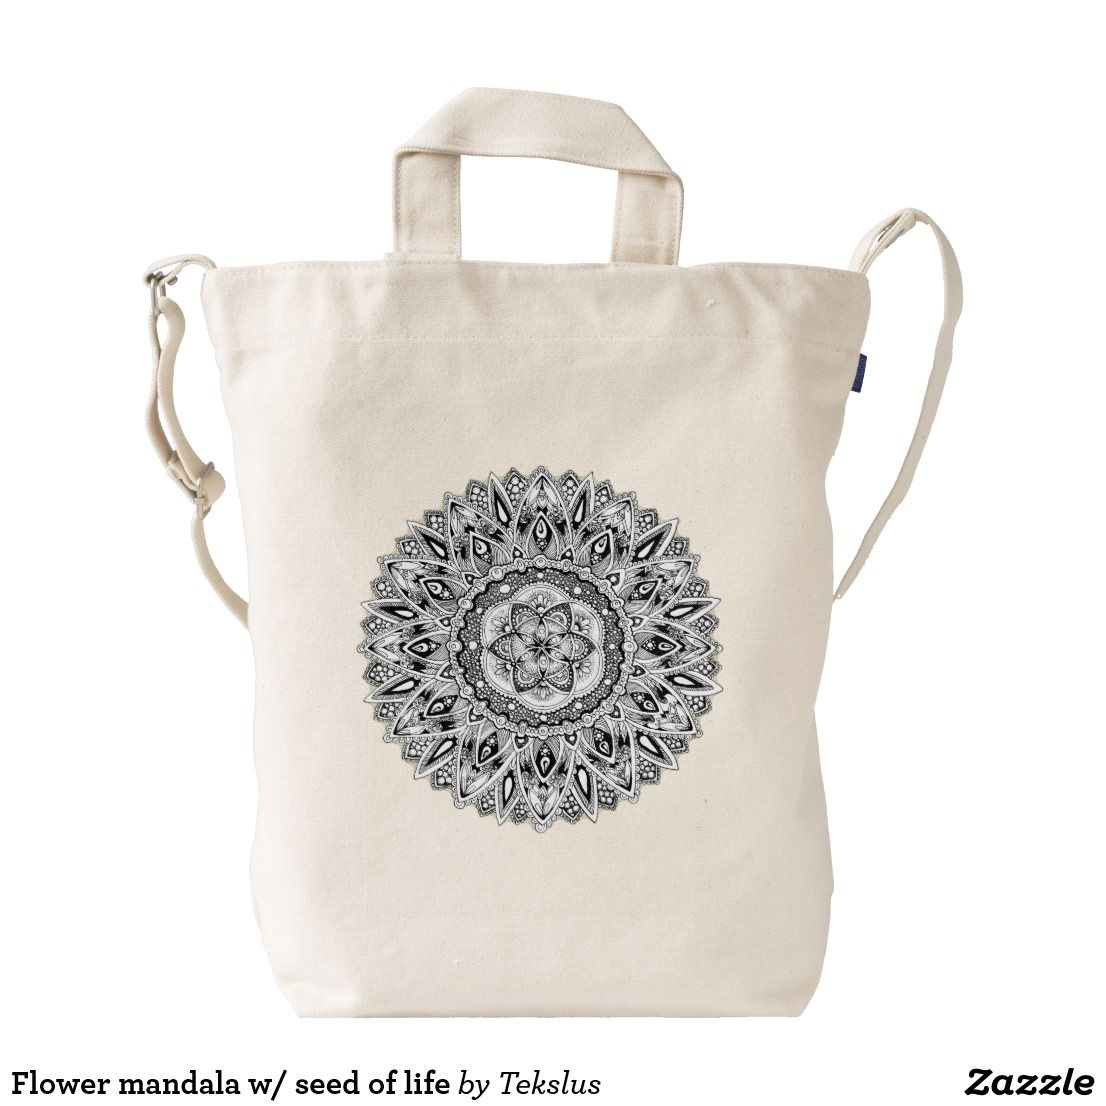 Flower mandala w/ seed of life